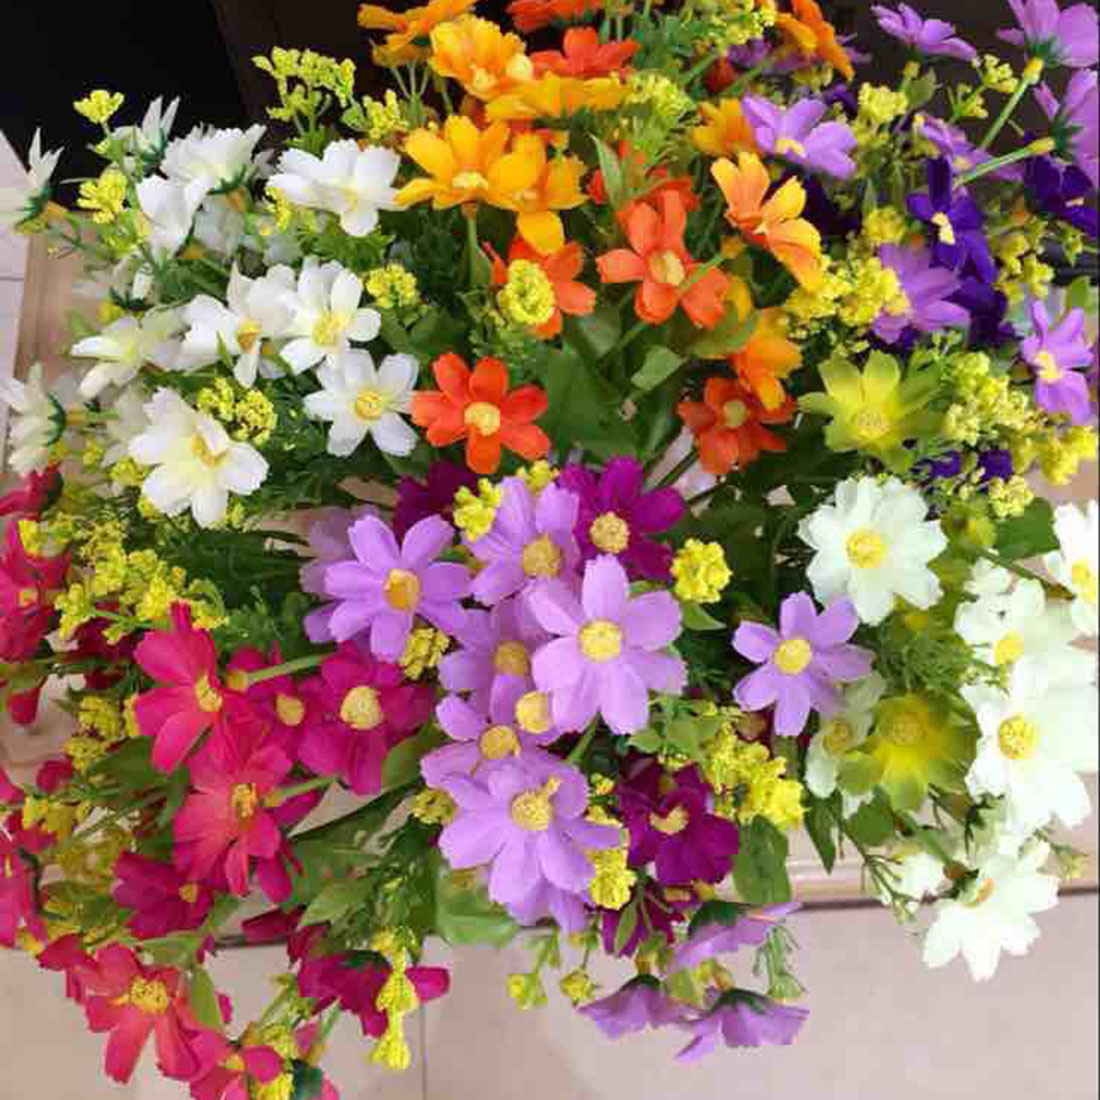 Aliexpress Buy Hot Sale 1 Bouquet 28 Heads Fake Daisy